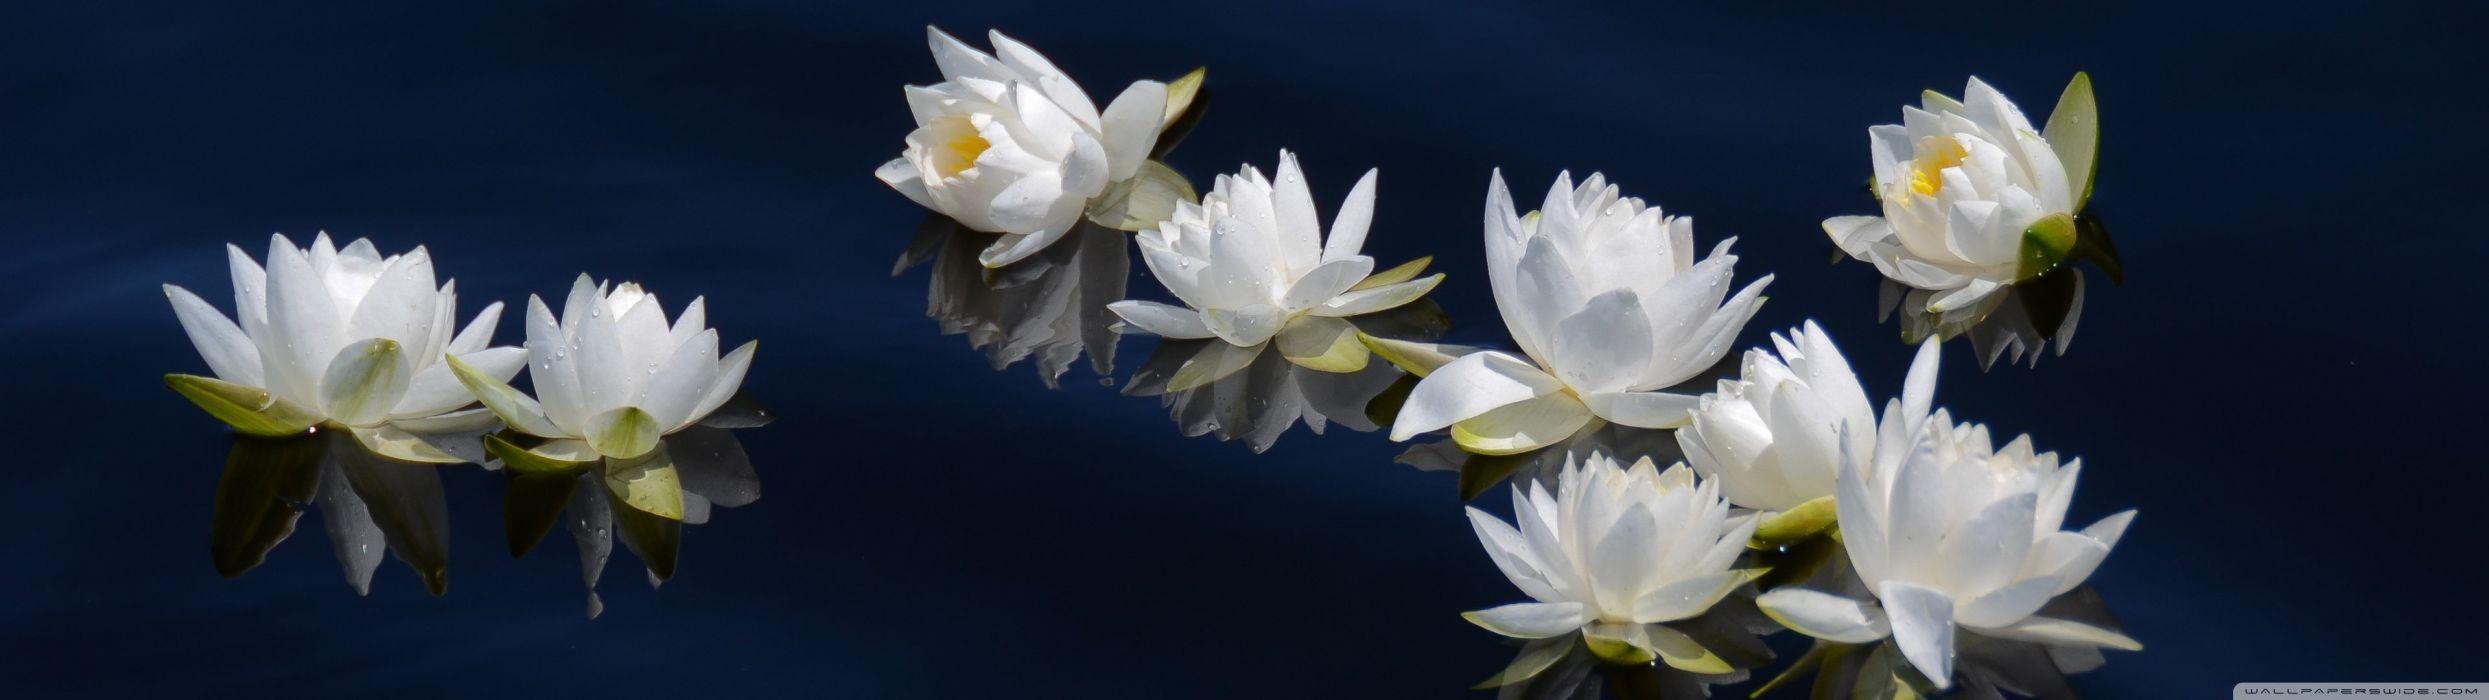 dual monitor screen multi multiple fleur flower fleurs flowers blanc